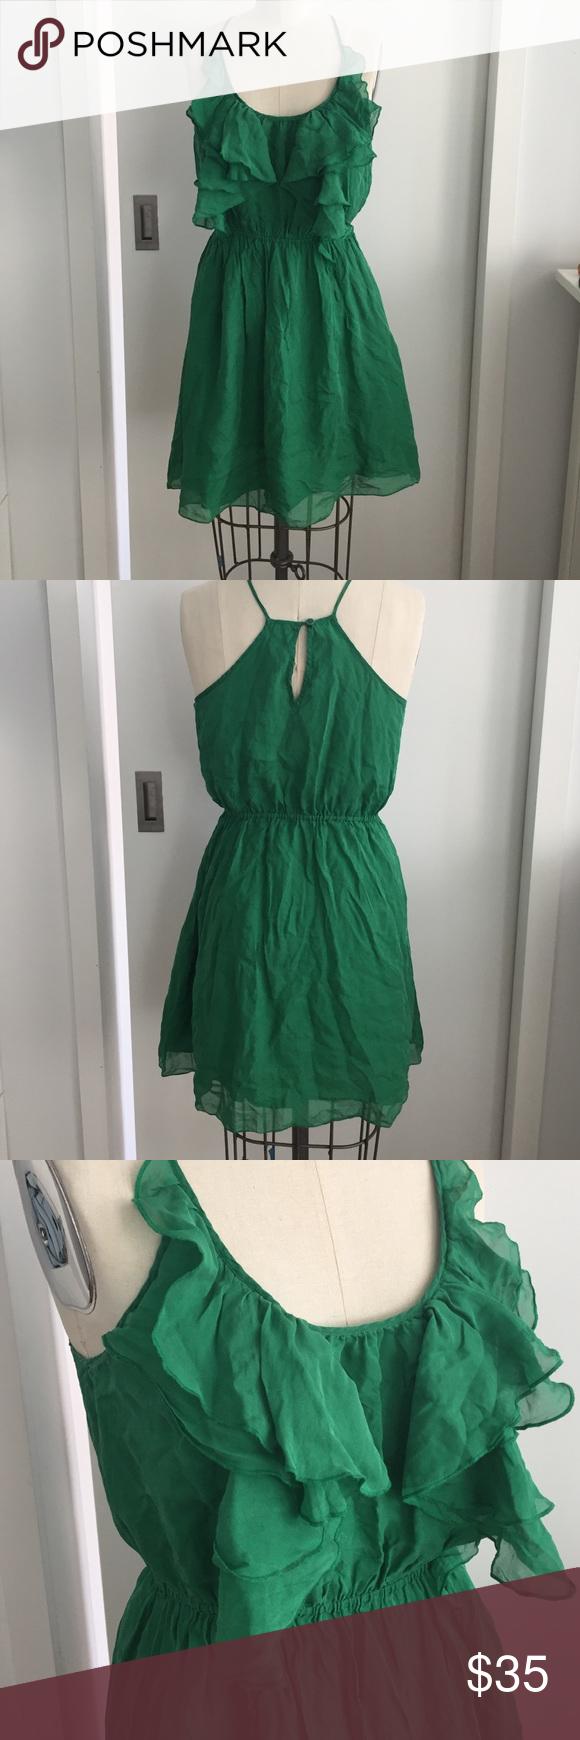 Rebecca Taylor 100% silk ruffle dress Gorgeous 100% silk chiffon ruffled dress by Rebecca Taylor. Fully lined. Elastic waist. Rebecca Taylor Dresses